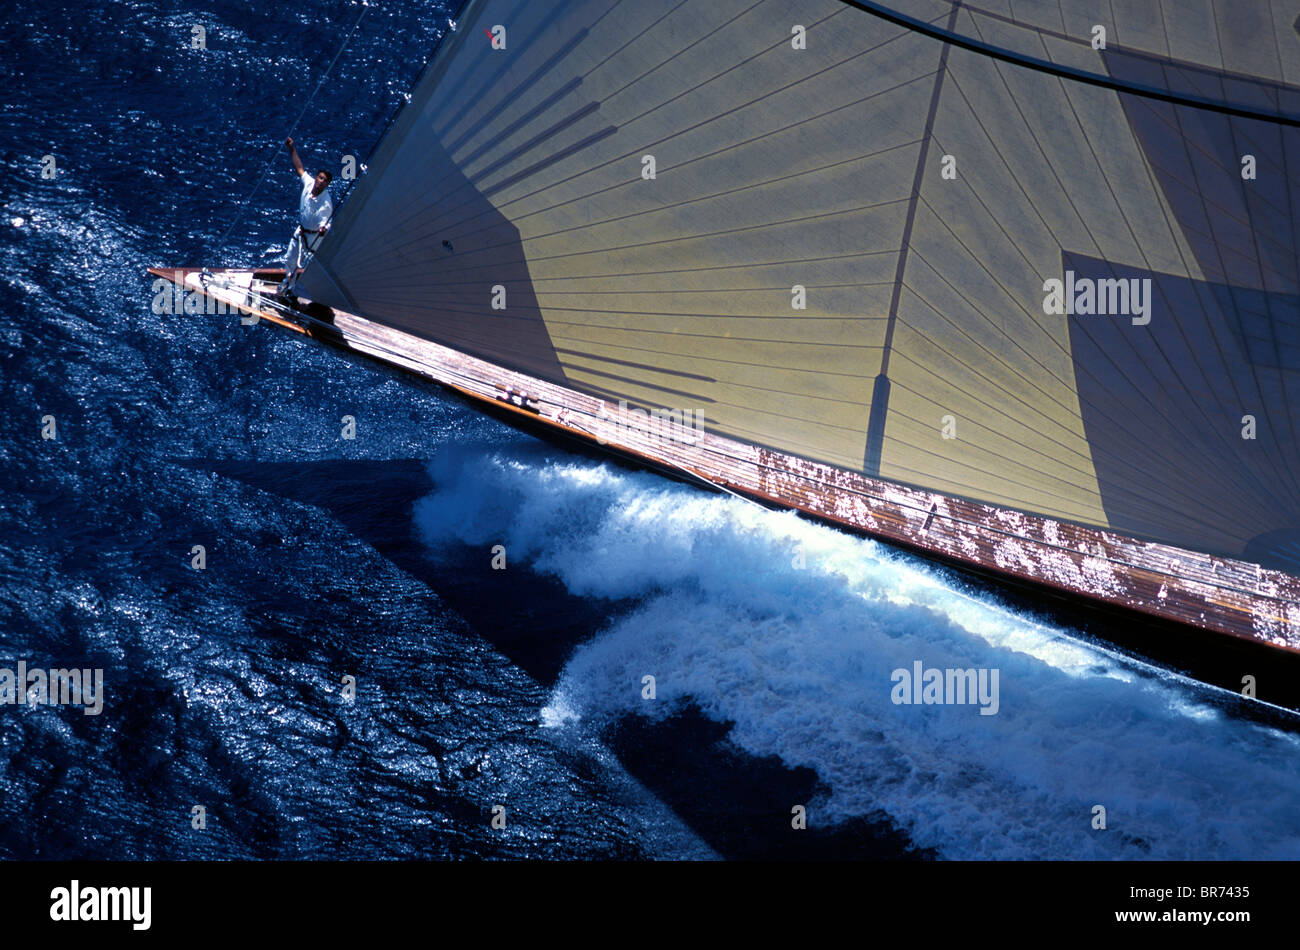 "Bowman aboard the J-Class ""Velsheda"", Antigua Classics, 1999. Stock Photo"